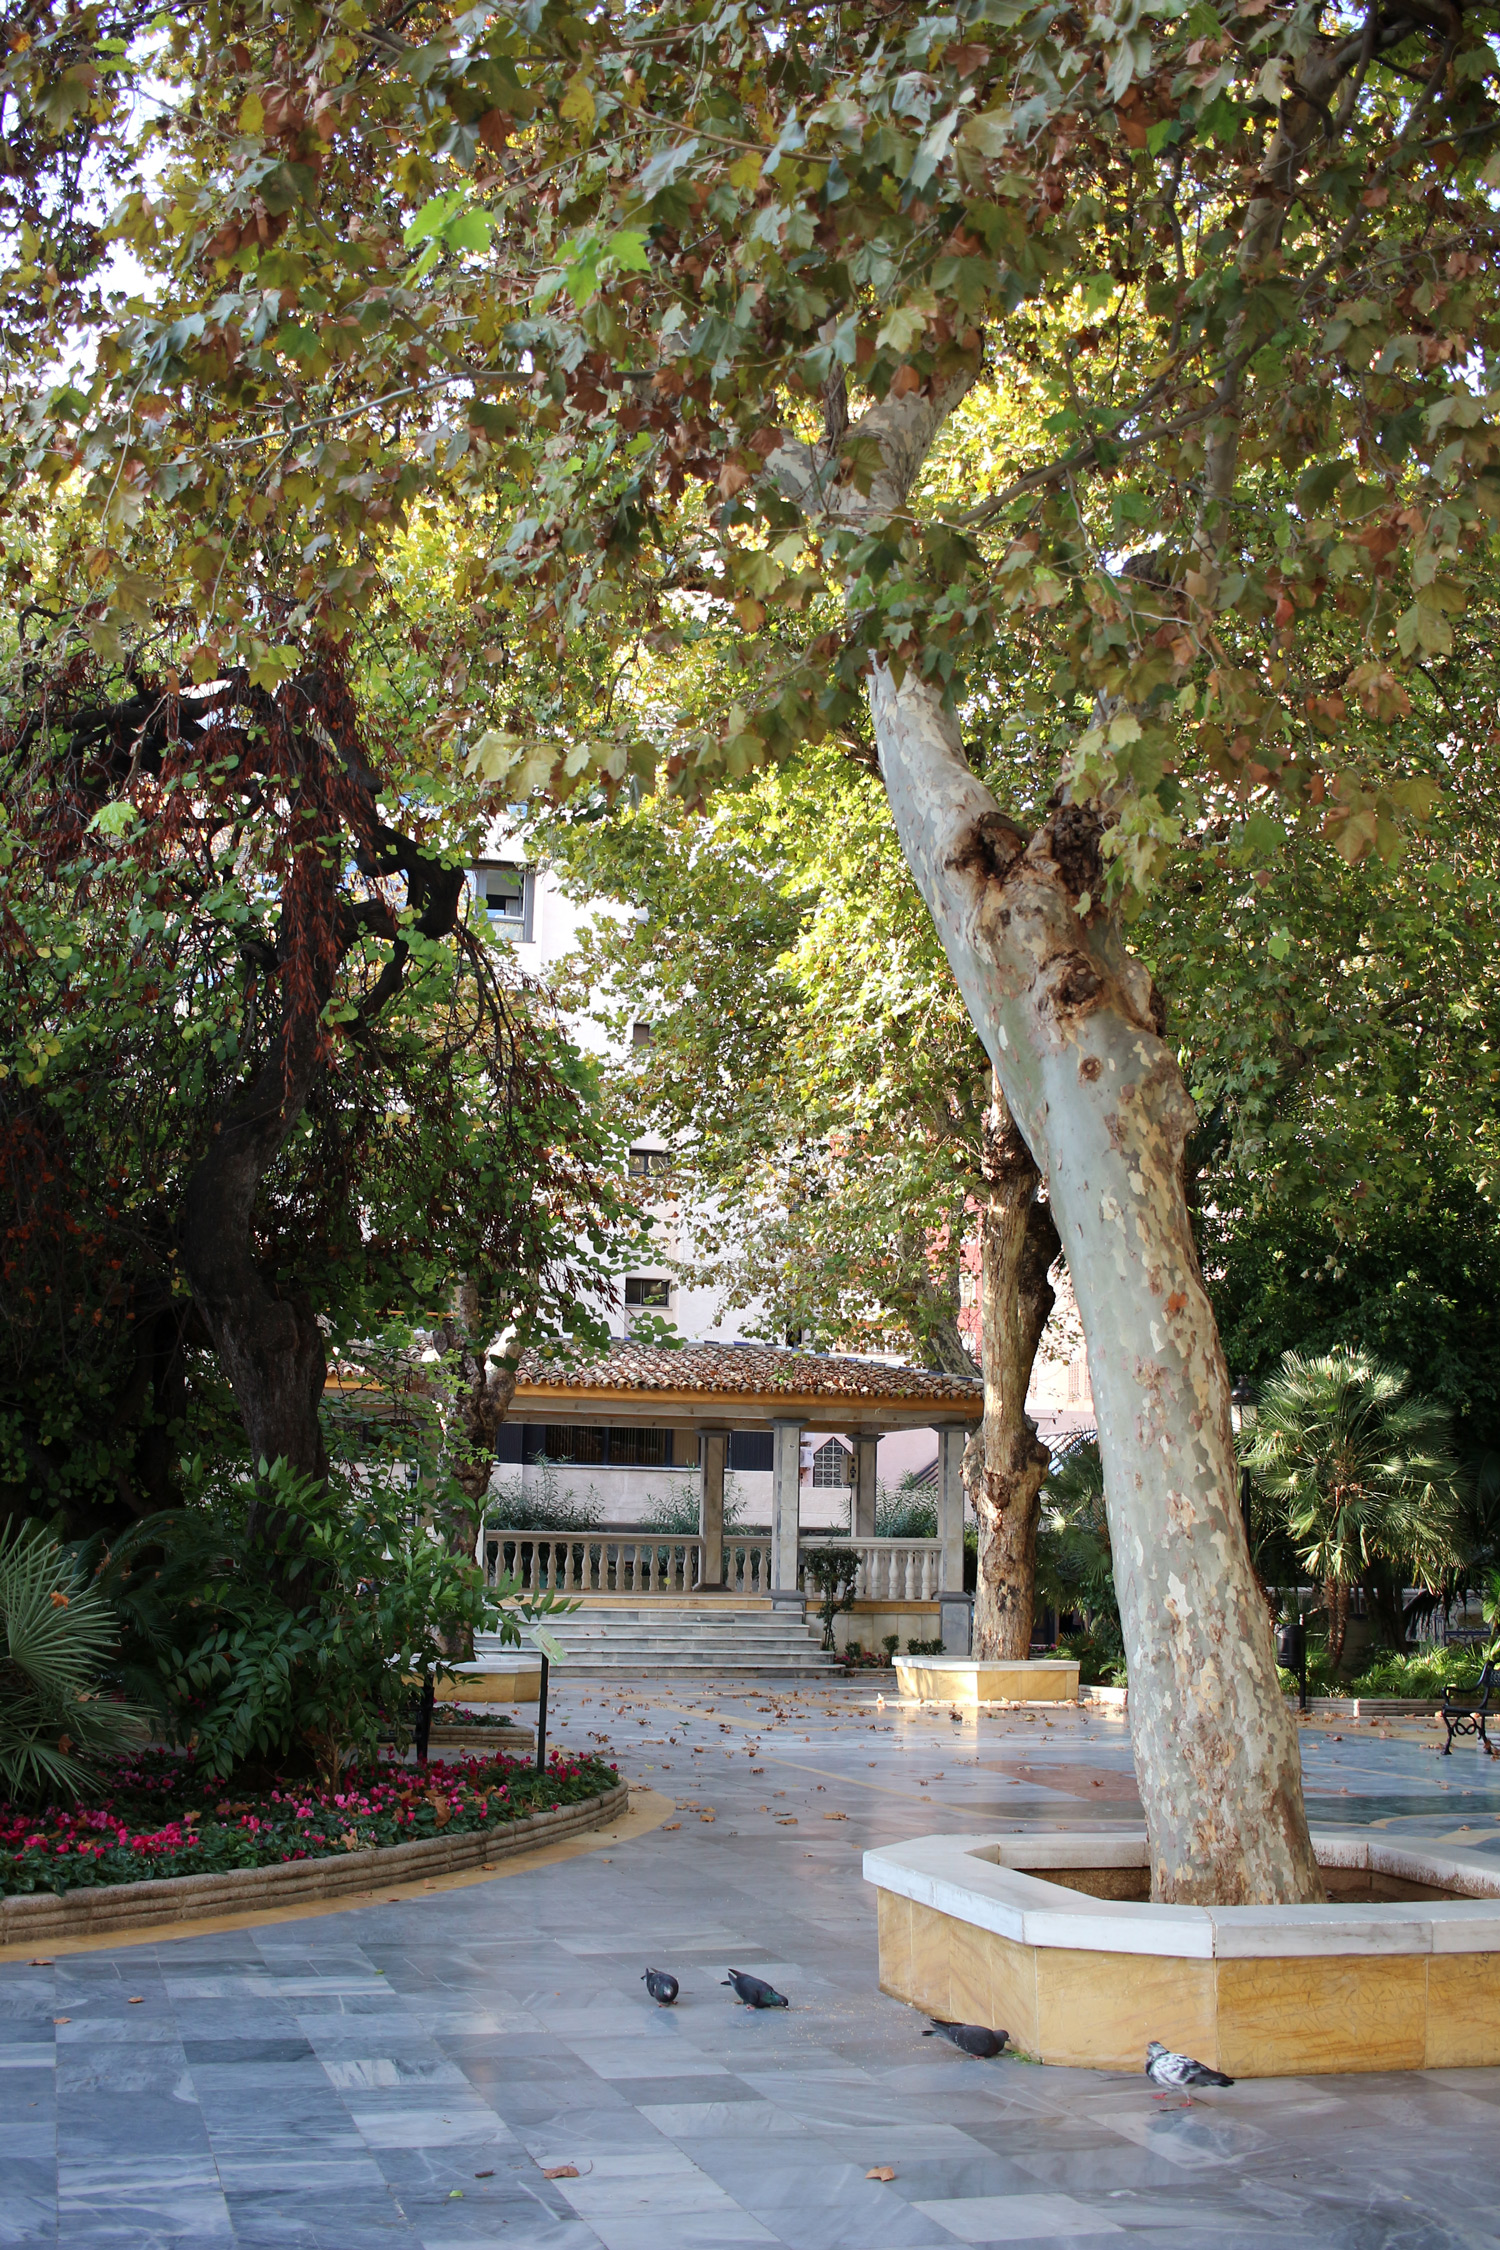 marbella-malaga-spain-travel-blogger-old-town-marbella-14